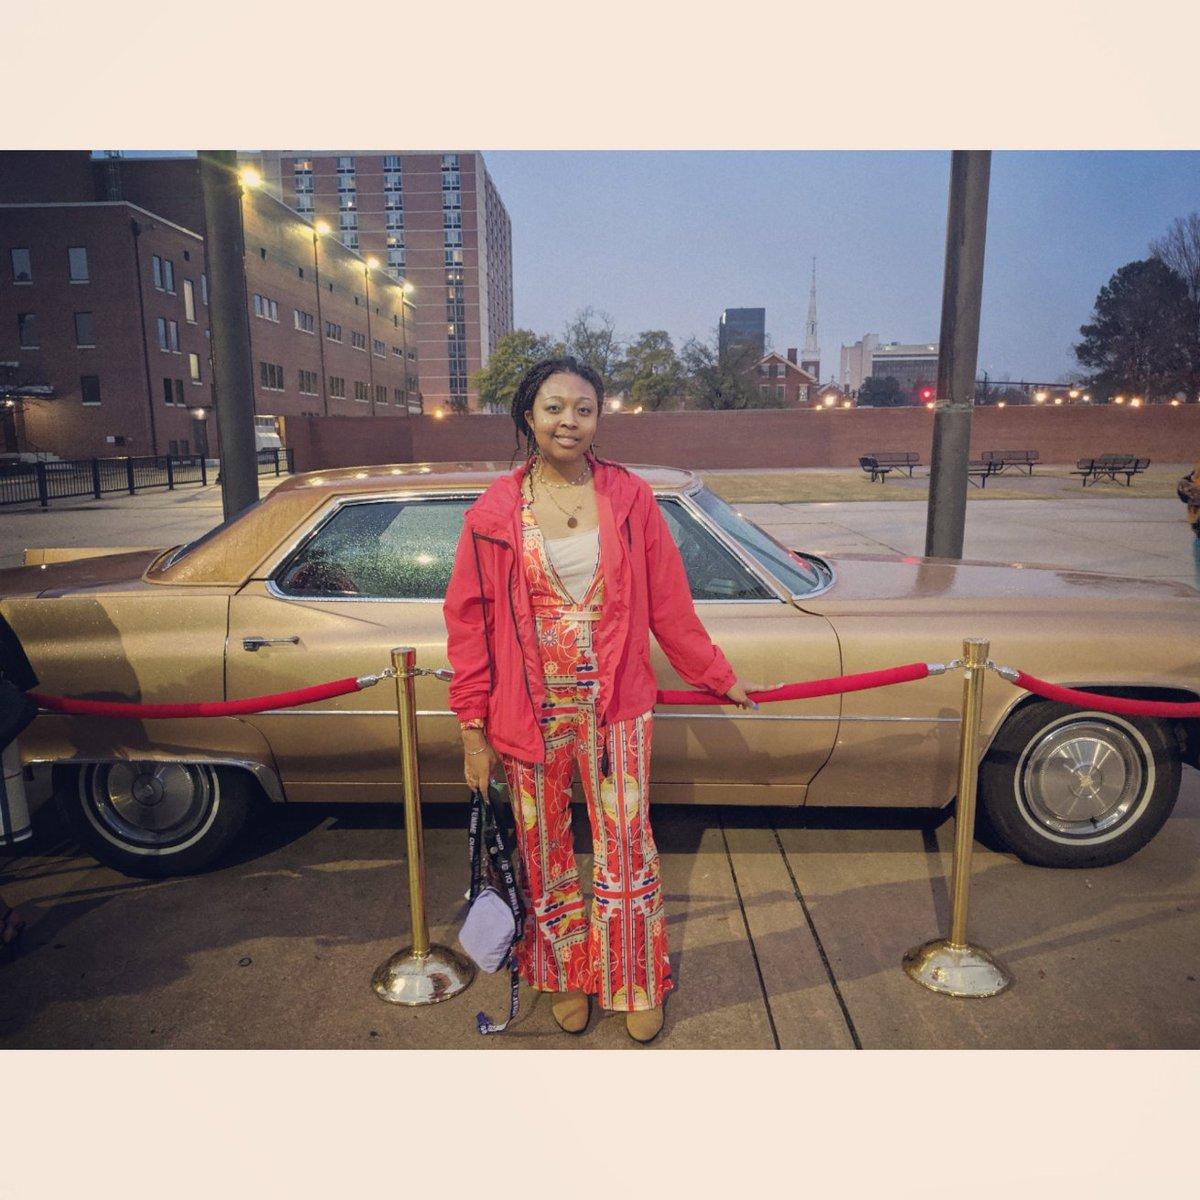 @madea  @tylerperry  I enjoyed everyone Sunday evening  Thank u for a job well done   Really enjoyed #Cora #Auntbam, #Mrbrown, #Madea & the entire cast  of #madeasfarewelltour  #jamesbrownarena #madealive #BlackHistoryMonth  #madeafarewelltour2020pic.twitter.com/yN4TjaQx3y